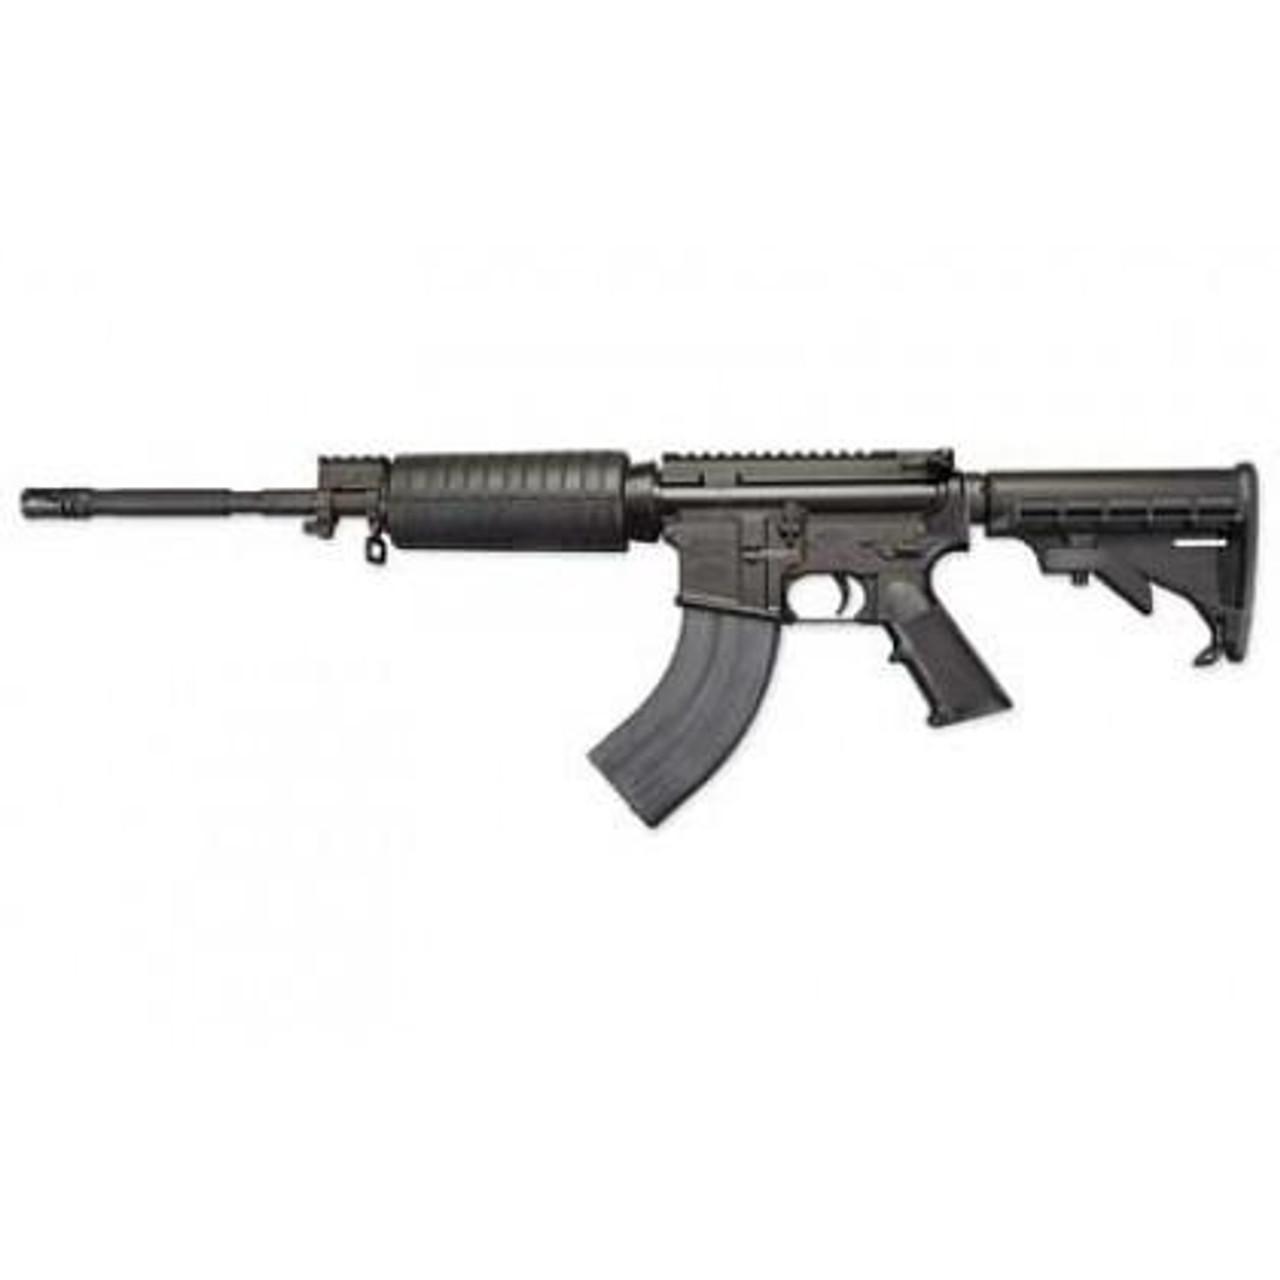 Windham Weaponry R16M4FTT-CALIFORNIA LEGAL-7.62x39